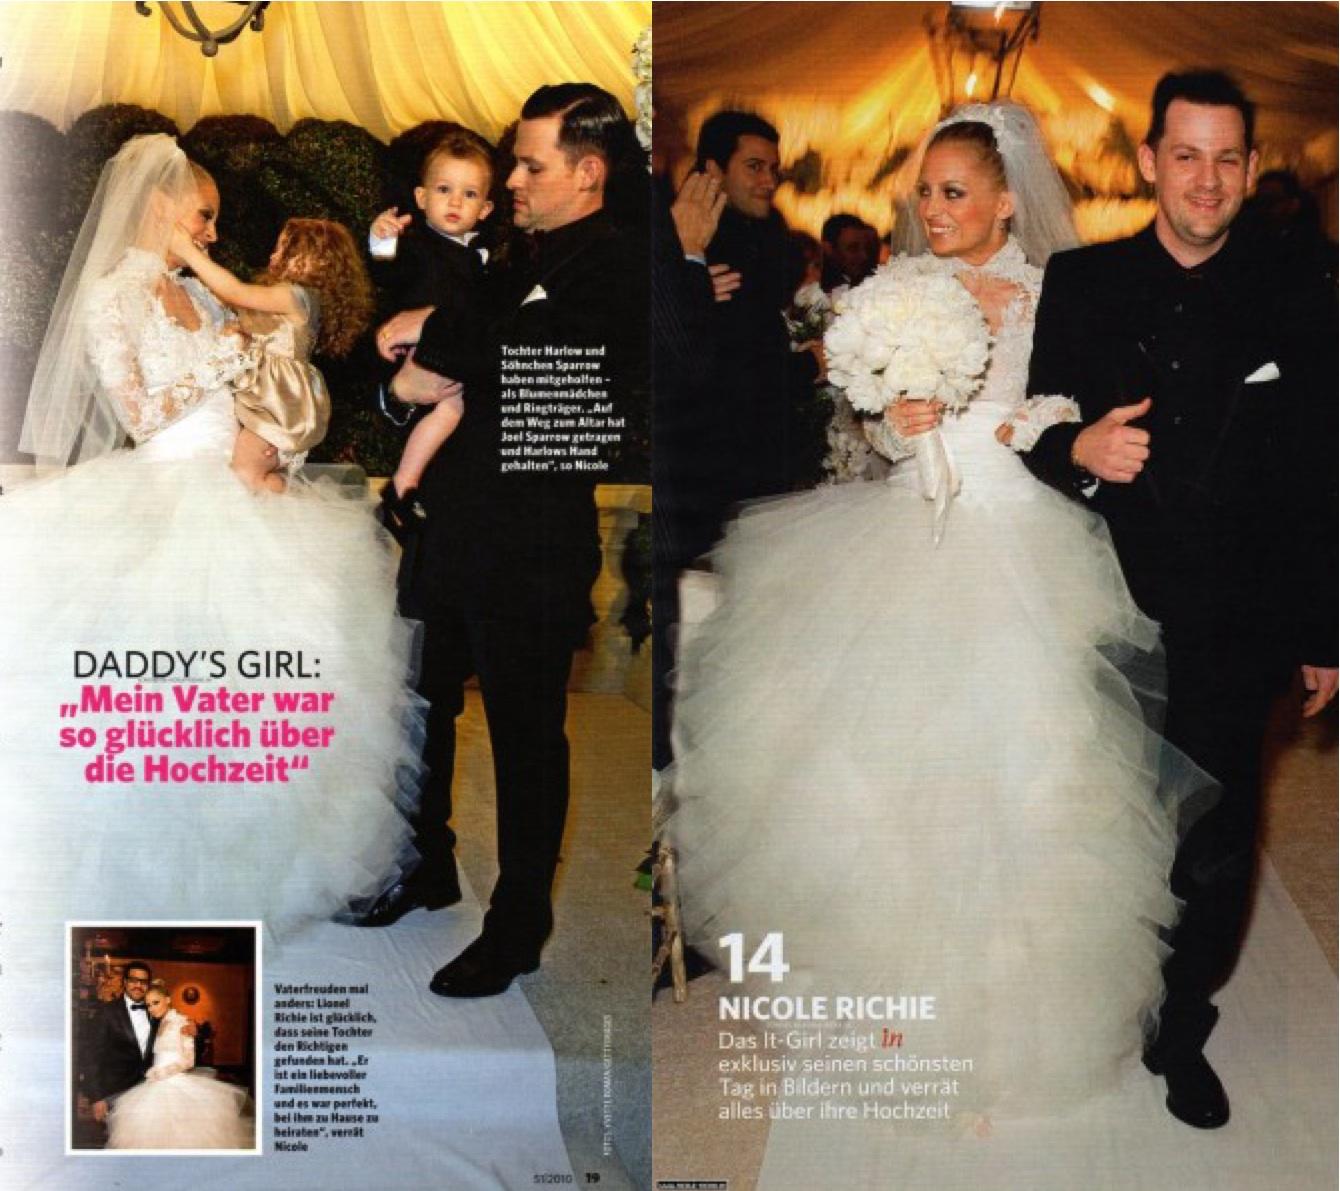 Nicole richie wedding dress pictures